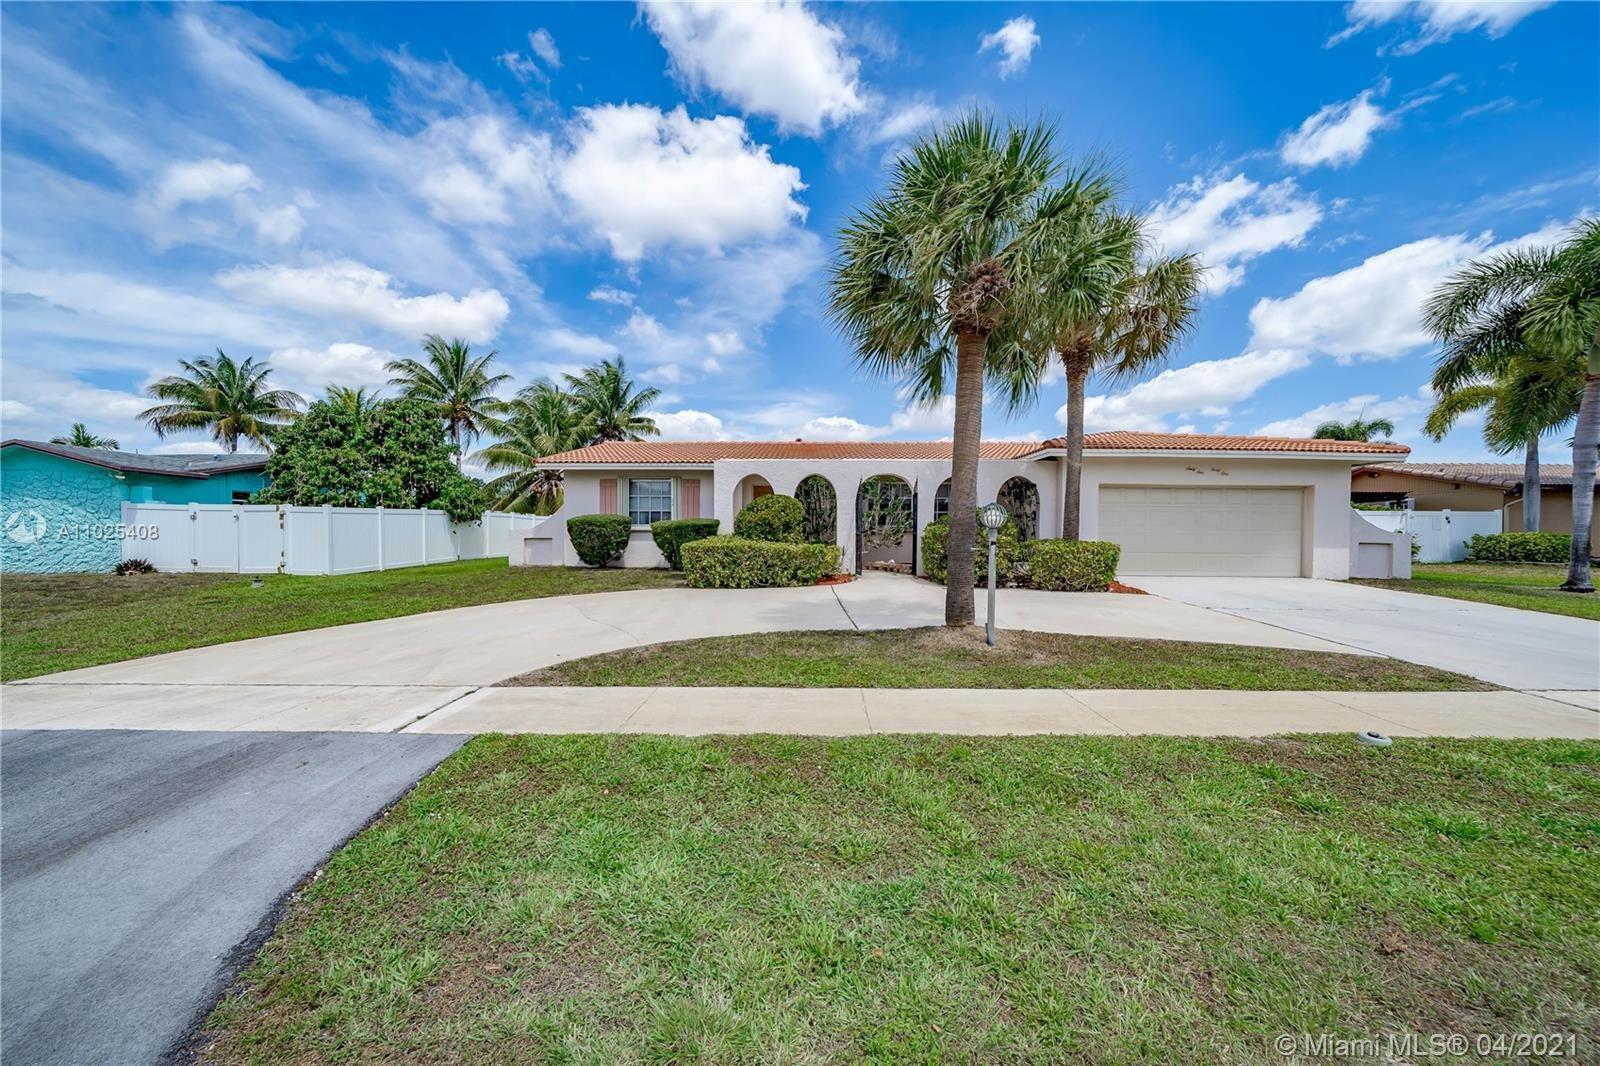 Photo of 6141 SW 15th St, Plantation, FL 33317 (MLS # A11025408)